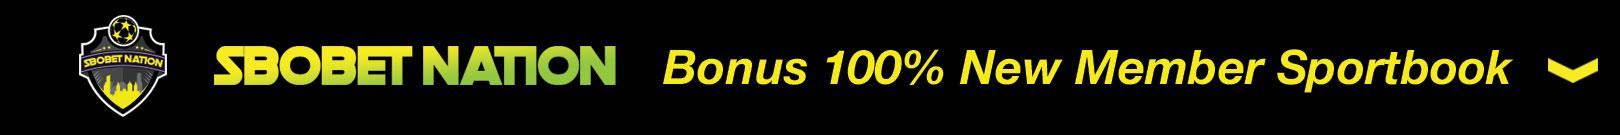 Promo Bonus 100% New Member Sportsbook